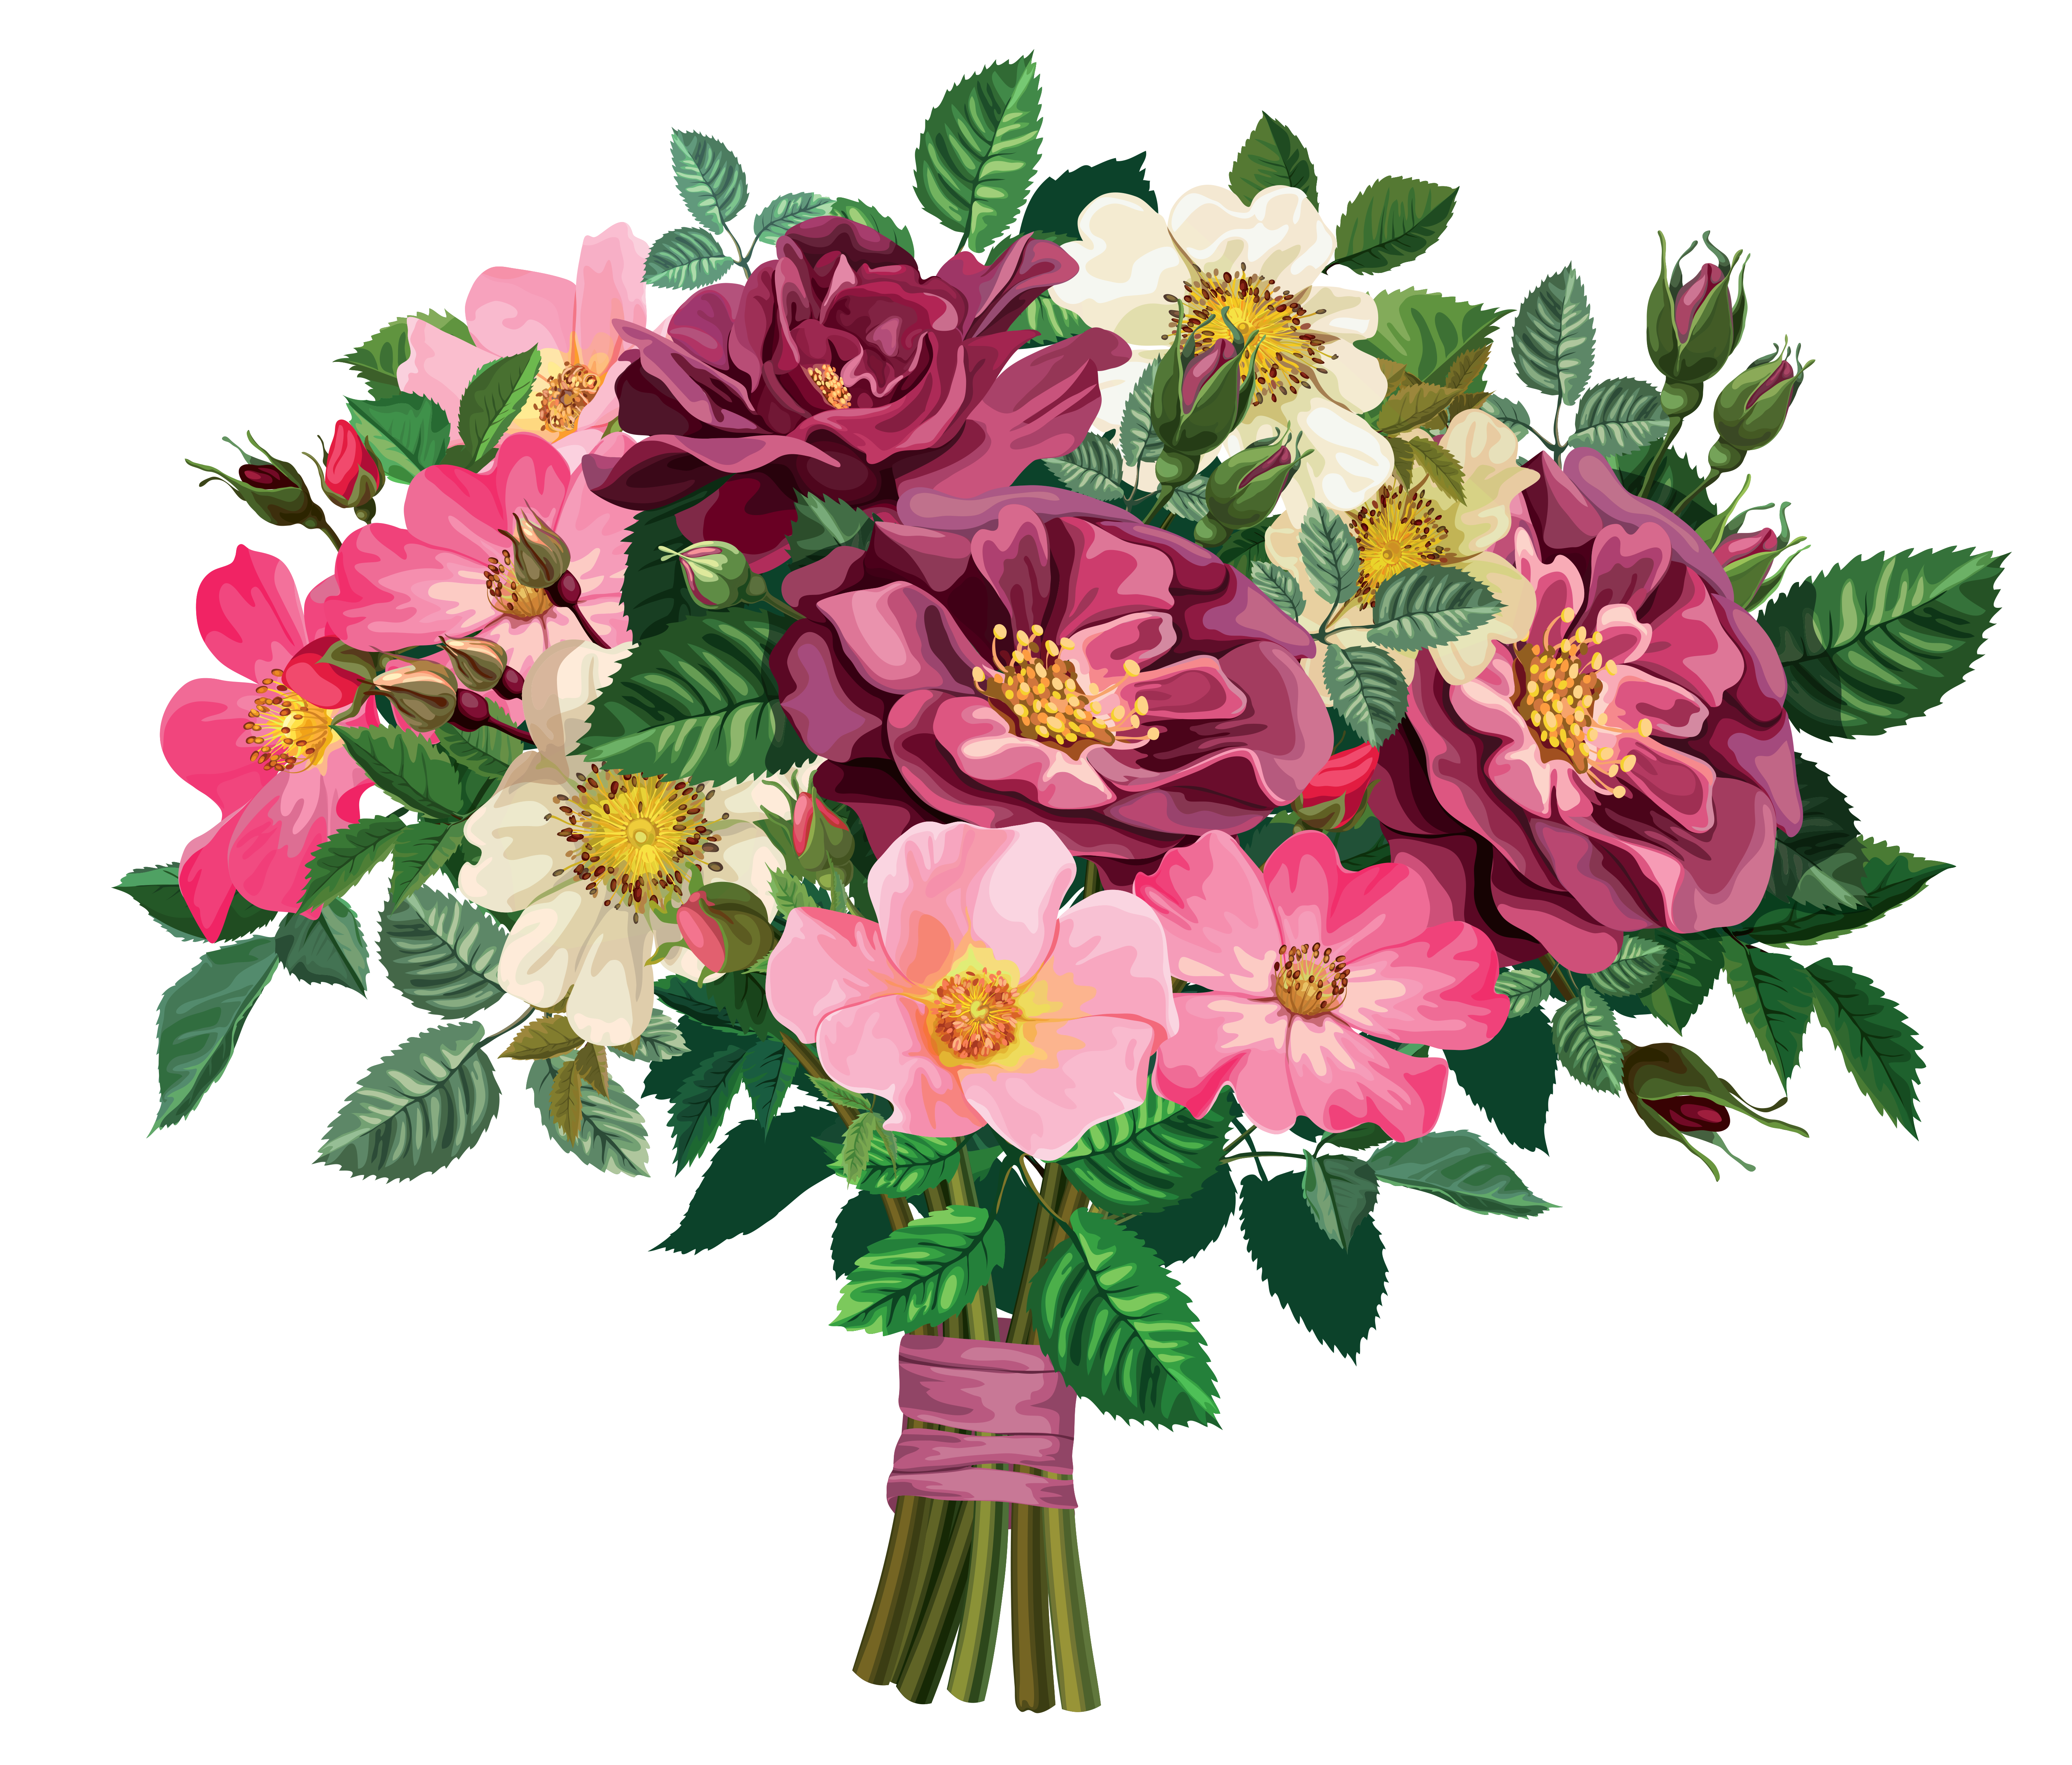 Flower Bouquet Clipart - .-Flower Bouquet Clipart - .-2